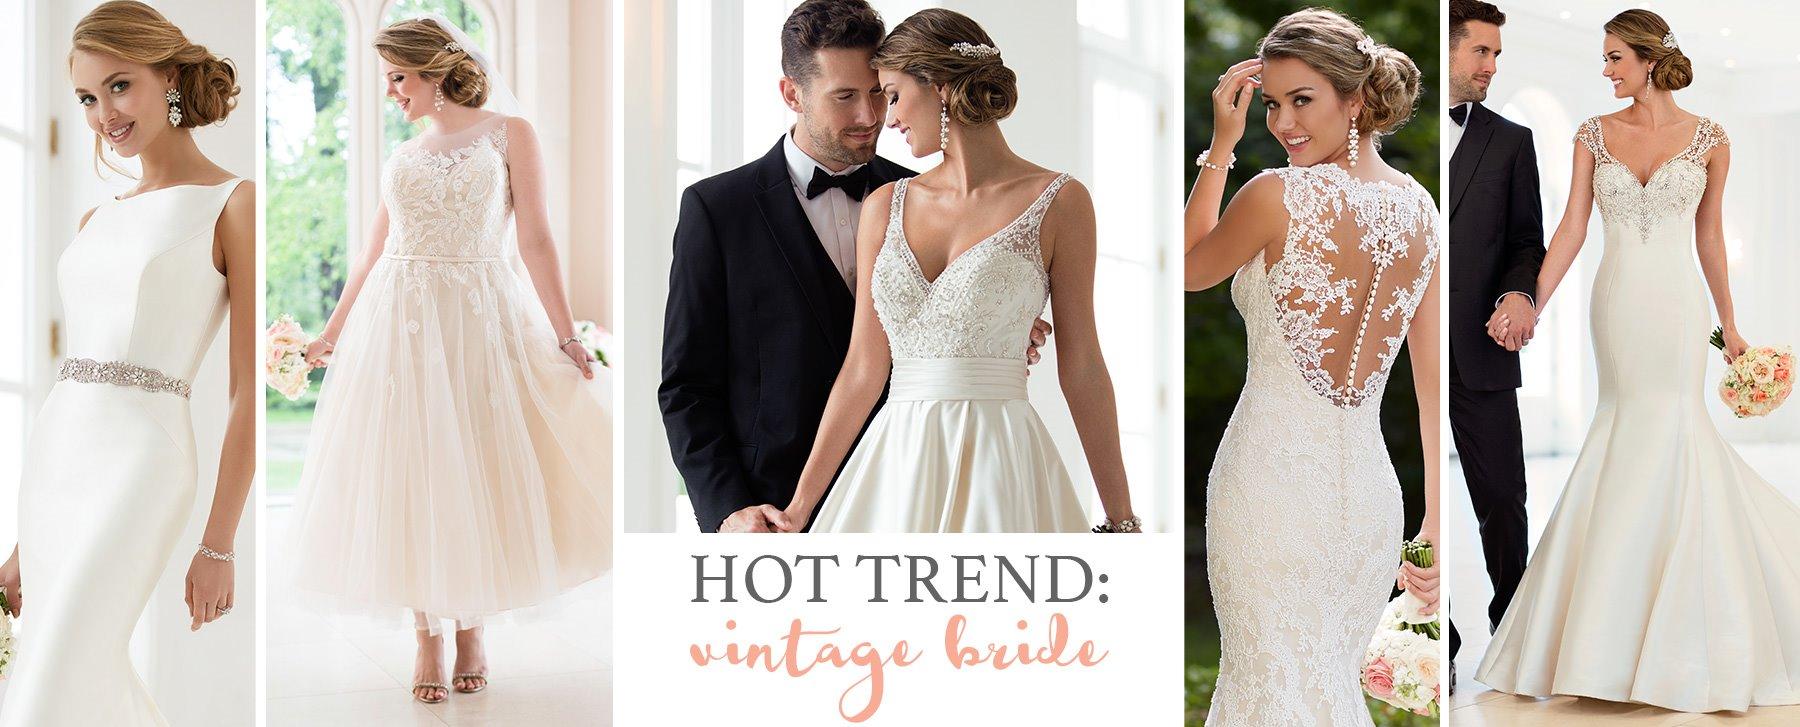 Love Boat Bridal Wedding Dress - Home